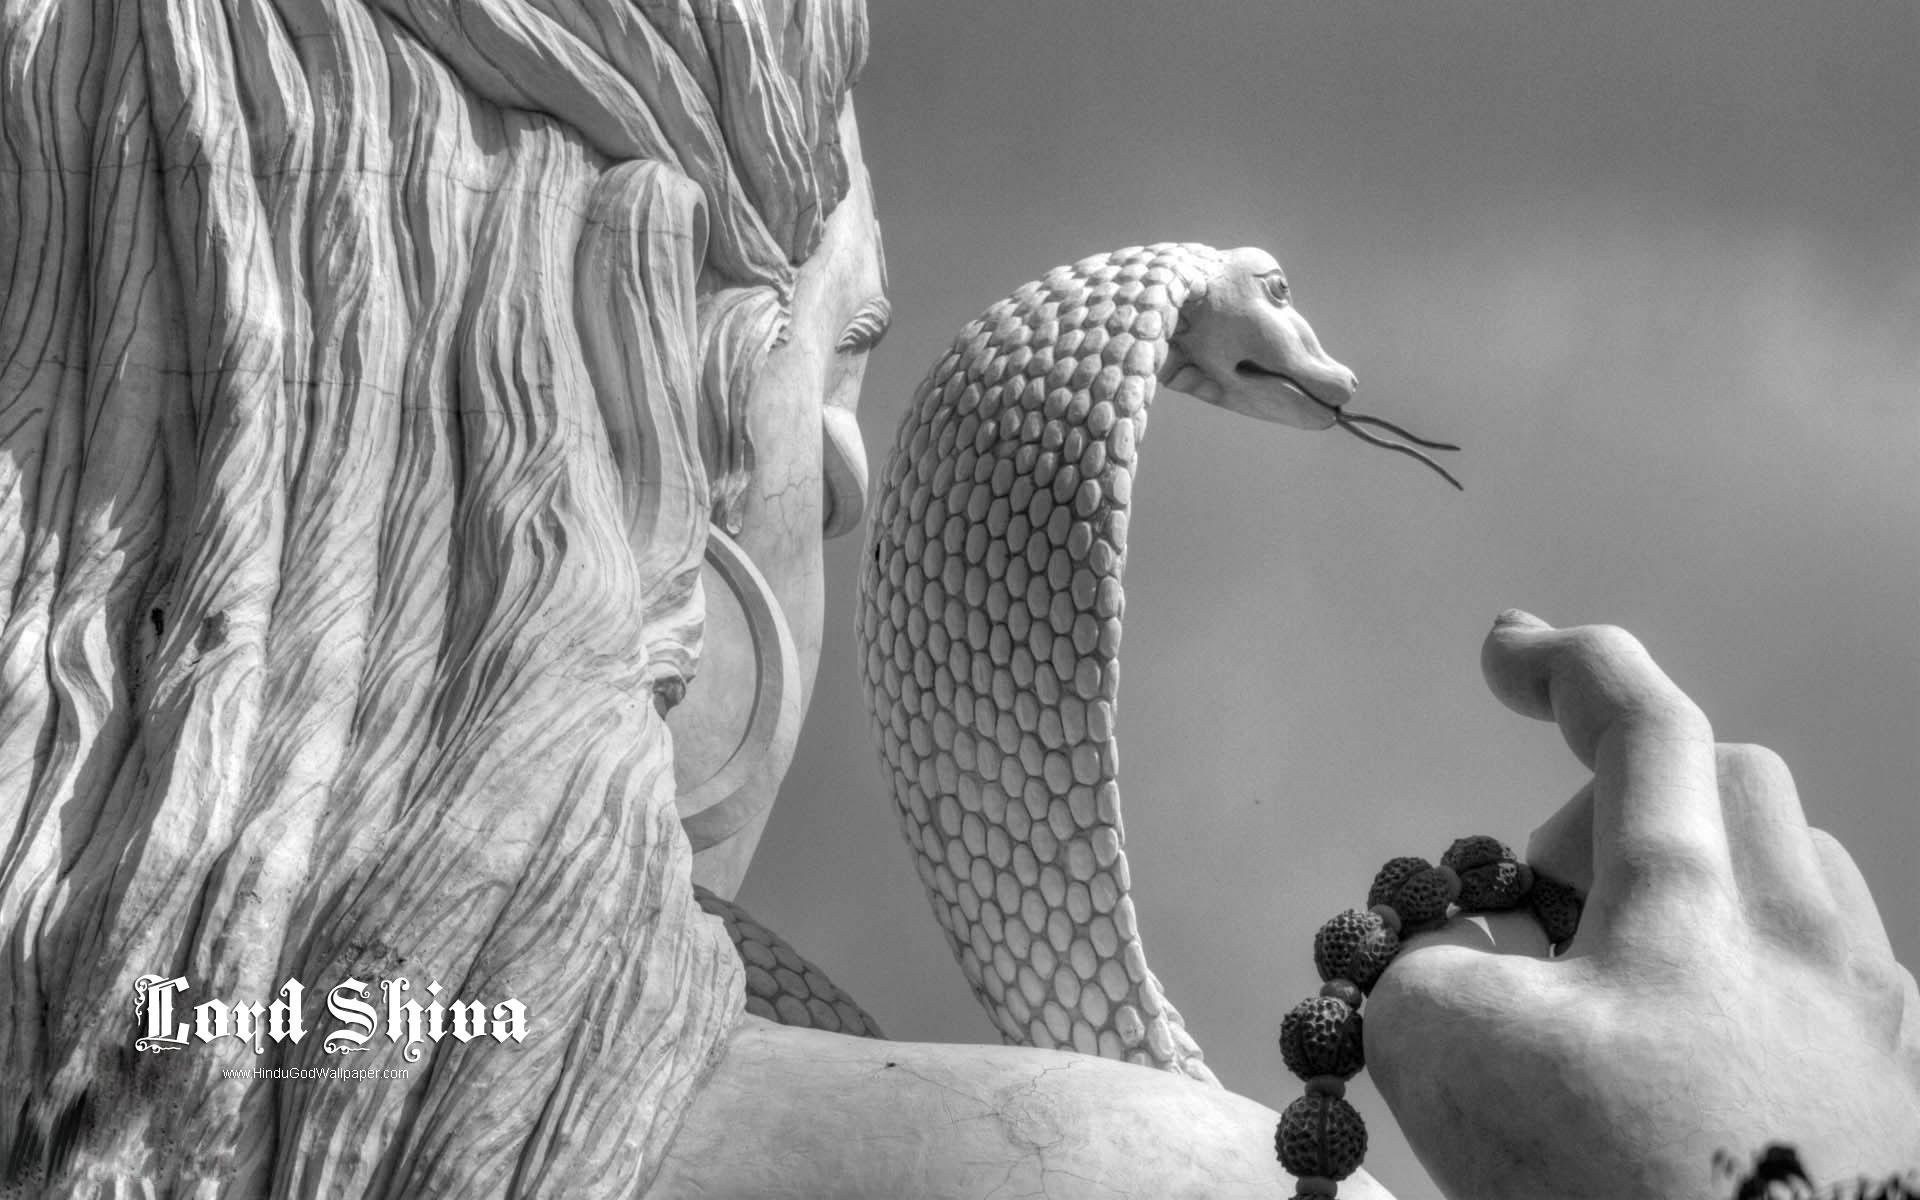 1366x768 Lord Shiva Desktop Background: 10 Amazing Lord Shiv Avatars